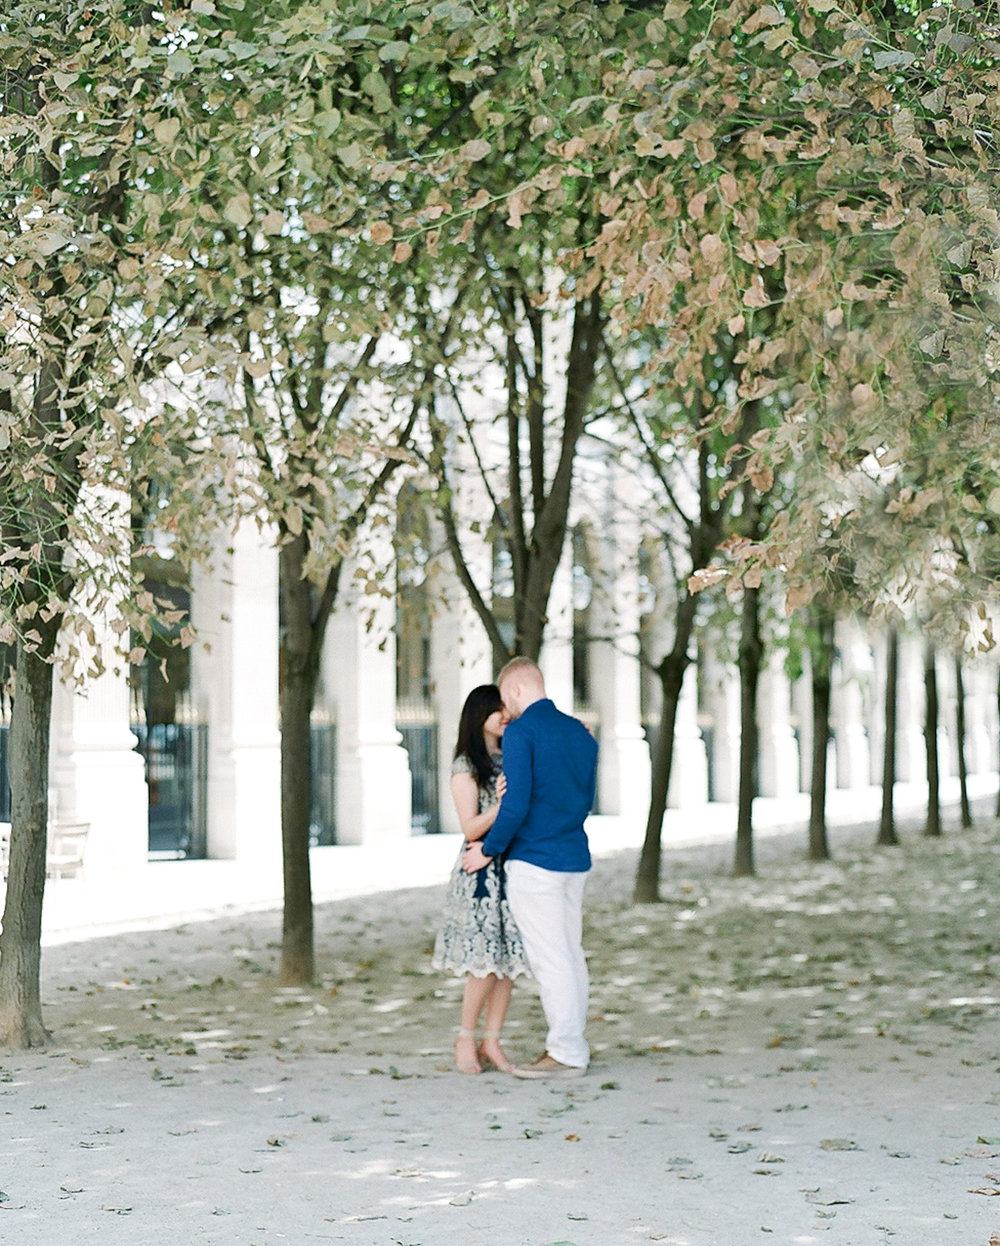 Bonphotage Paris Fine Art Honeymoon Photography